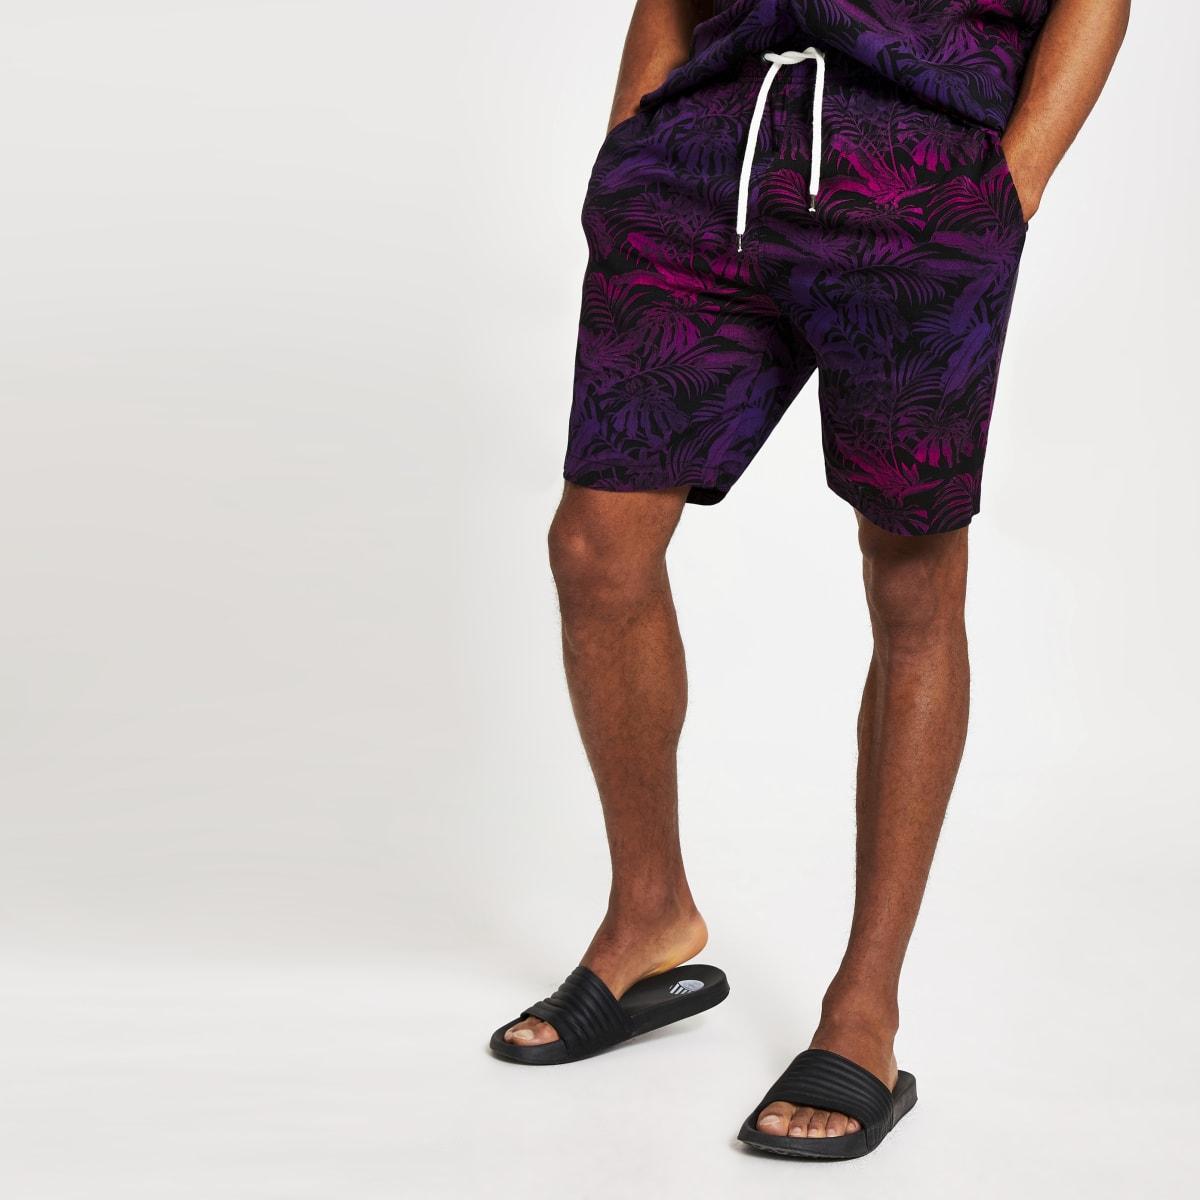 Jack & Jones – Shorts in Lila mit tropischem Print